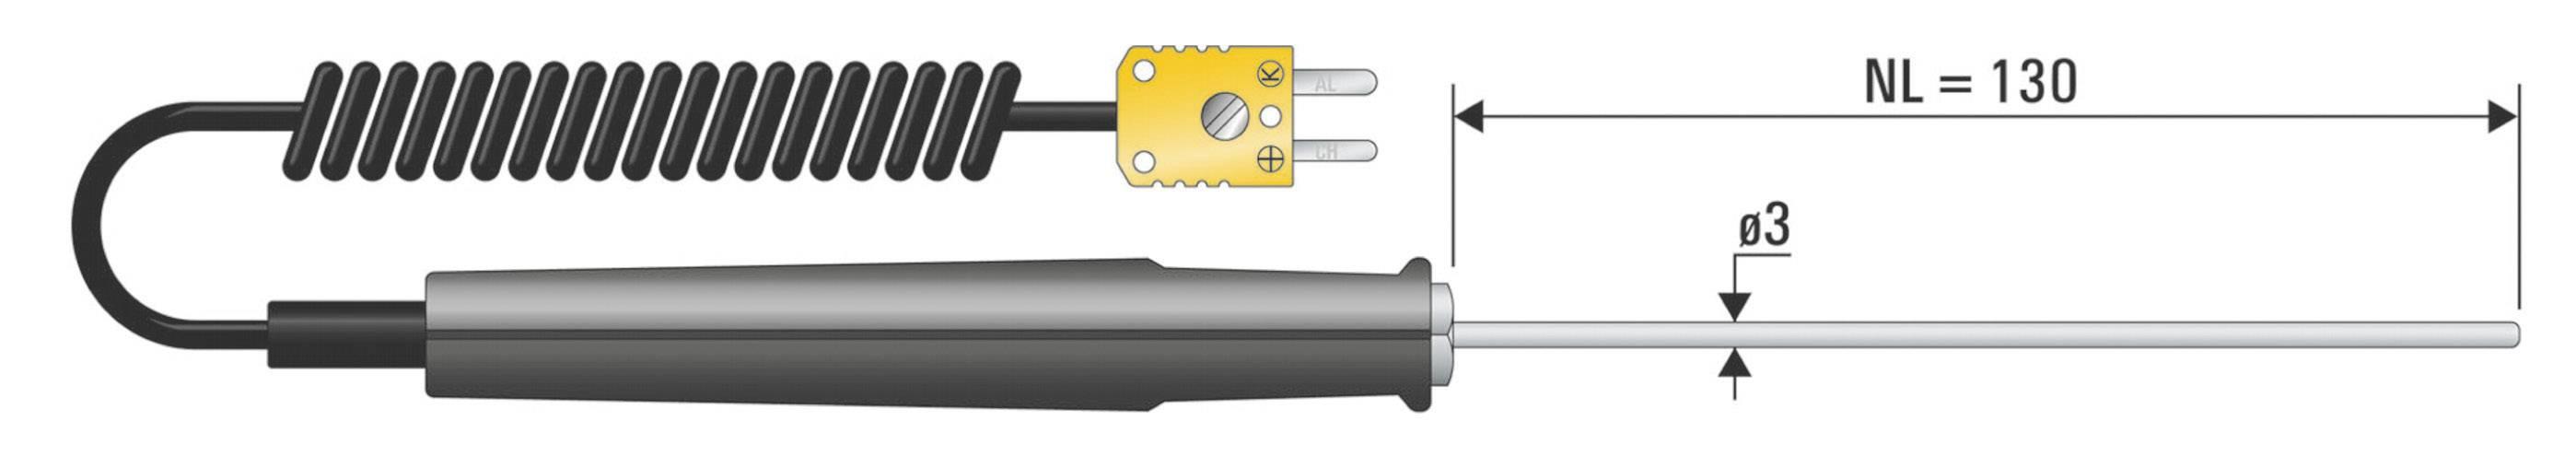 Teplotní čidlo B+B Thermo-technik, typ K (NiCrNi) B & B, -50 až 1150°C